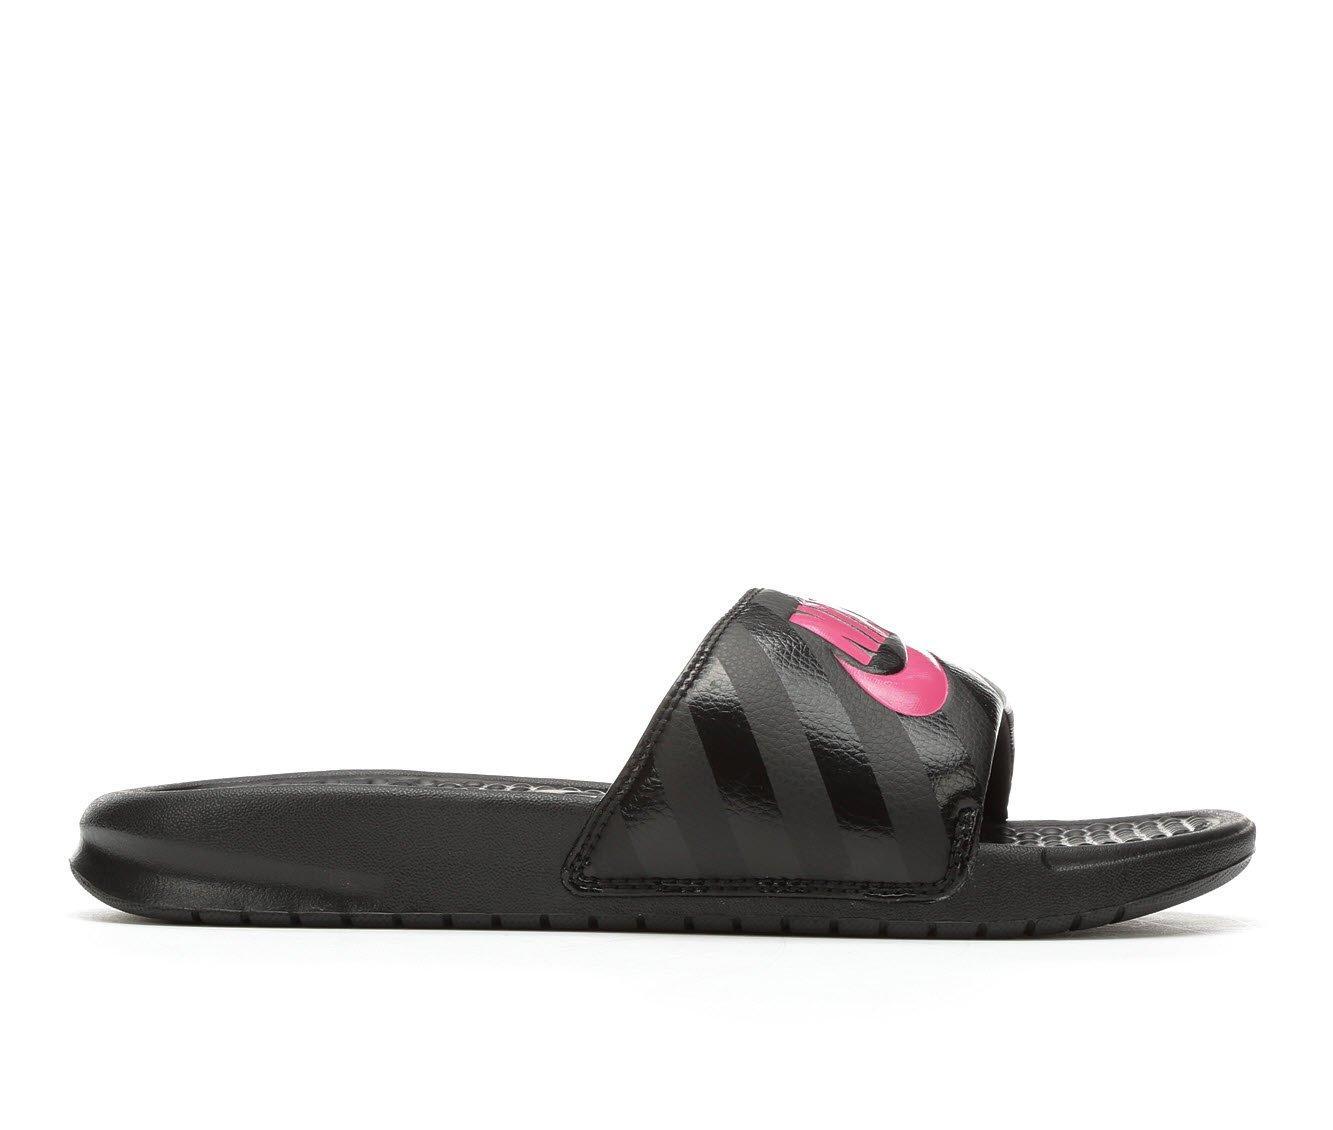 Lavender sandals shoes - Benassi Jdi